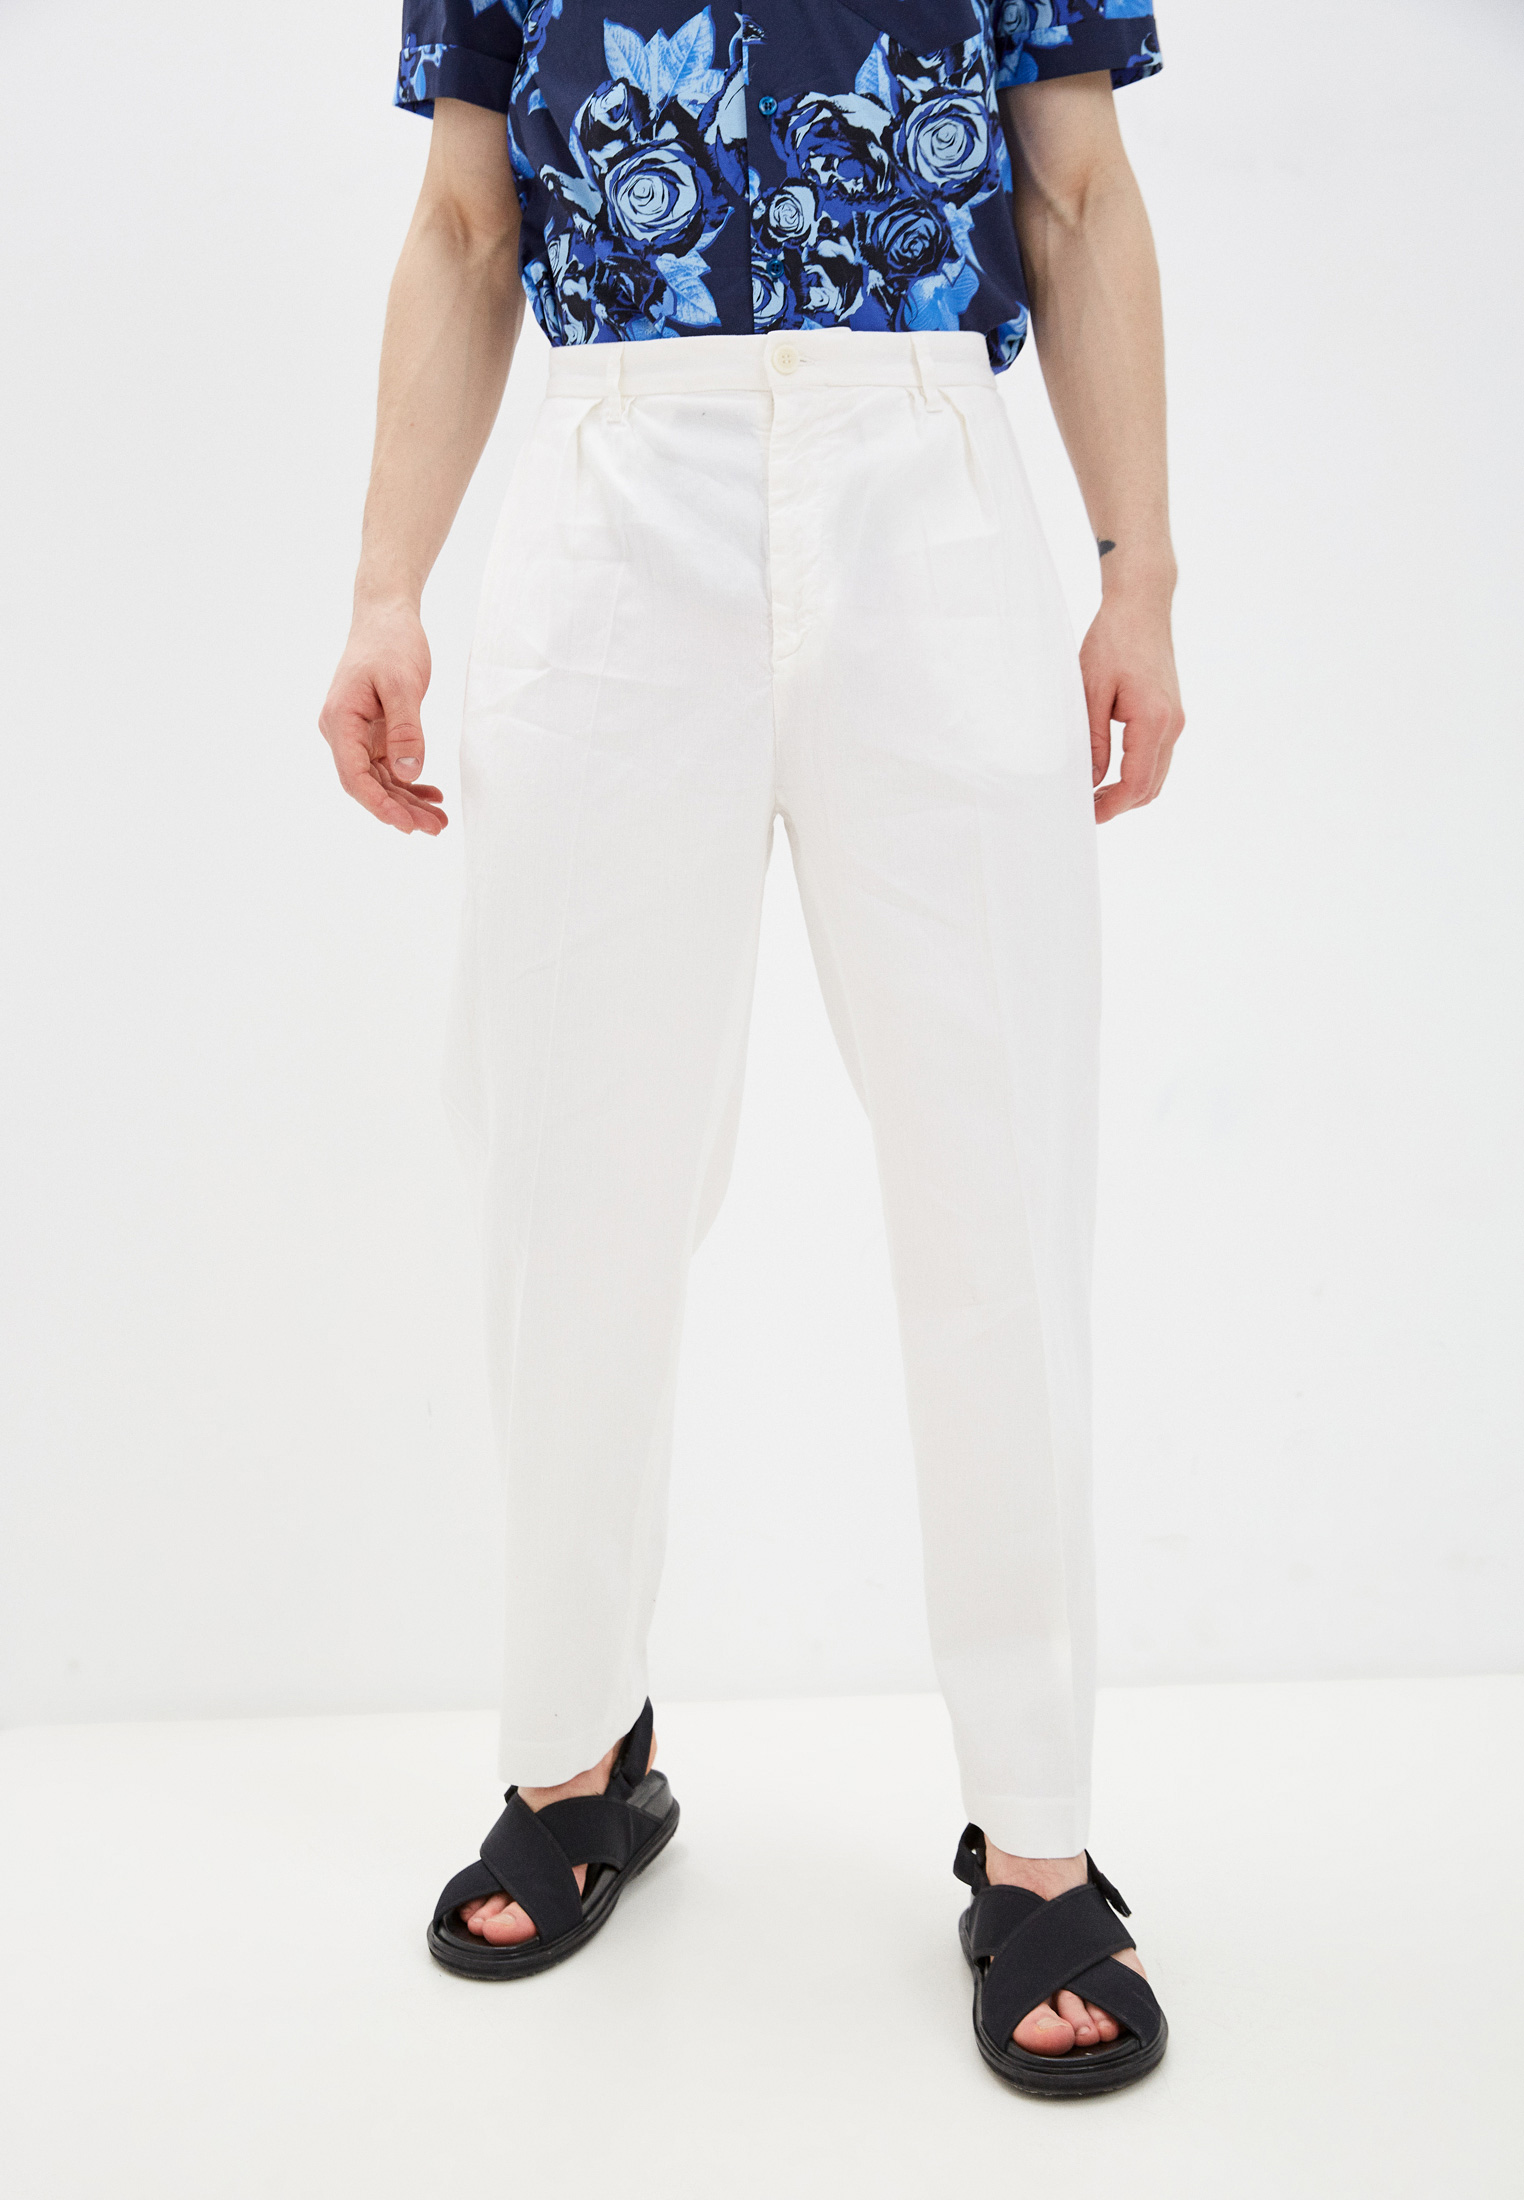 Мужские повседневные брюки Bikkembergs (Биккембергс) C P 059 00 S 3414